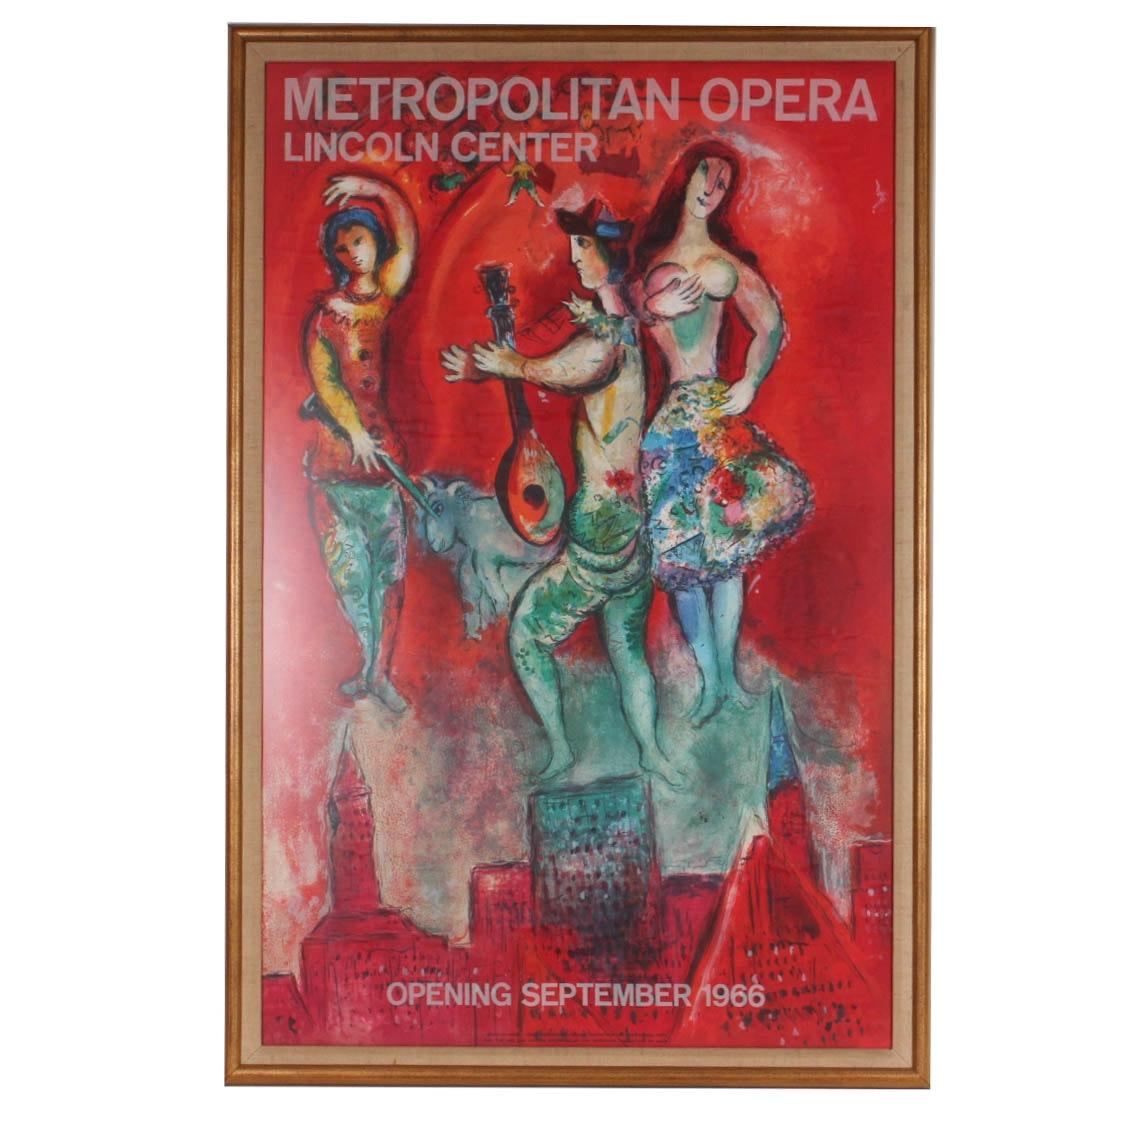 Marc Chagall Lithograph Metropolitan Opera Poster Print